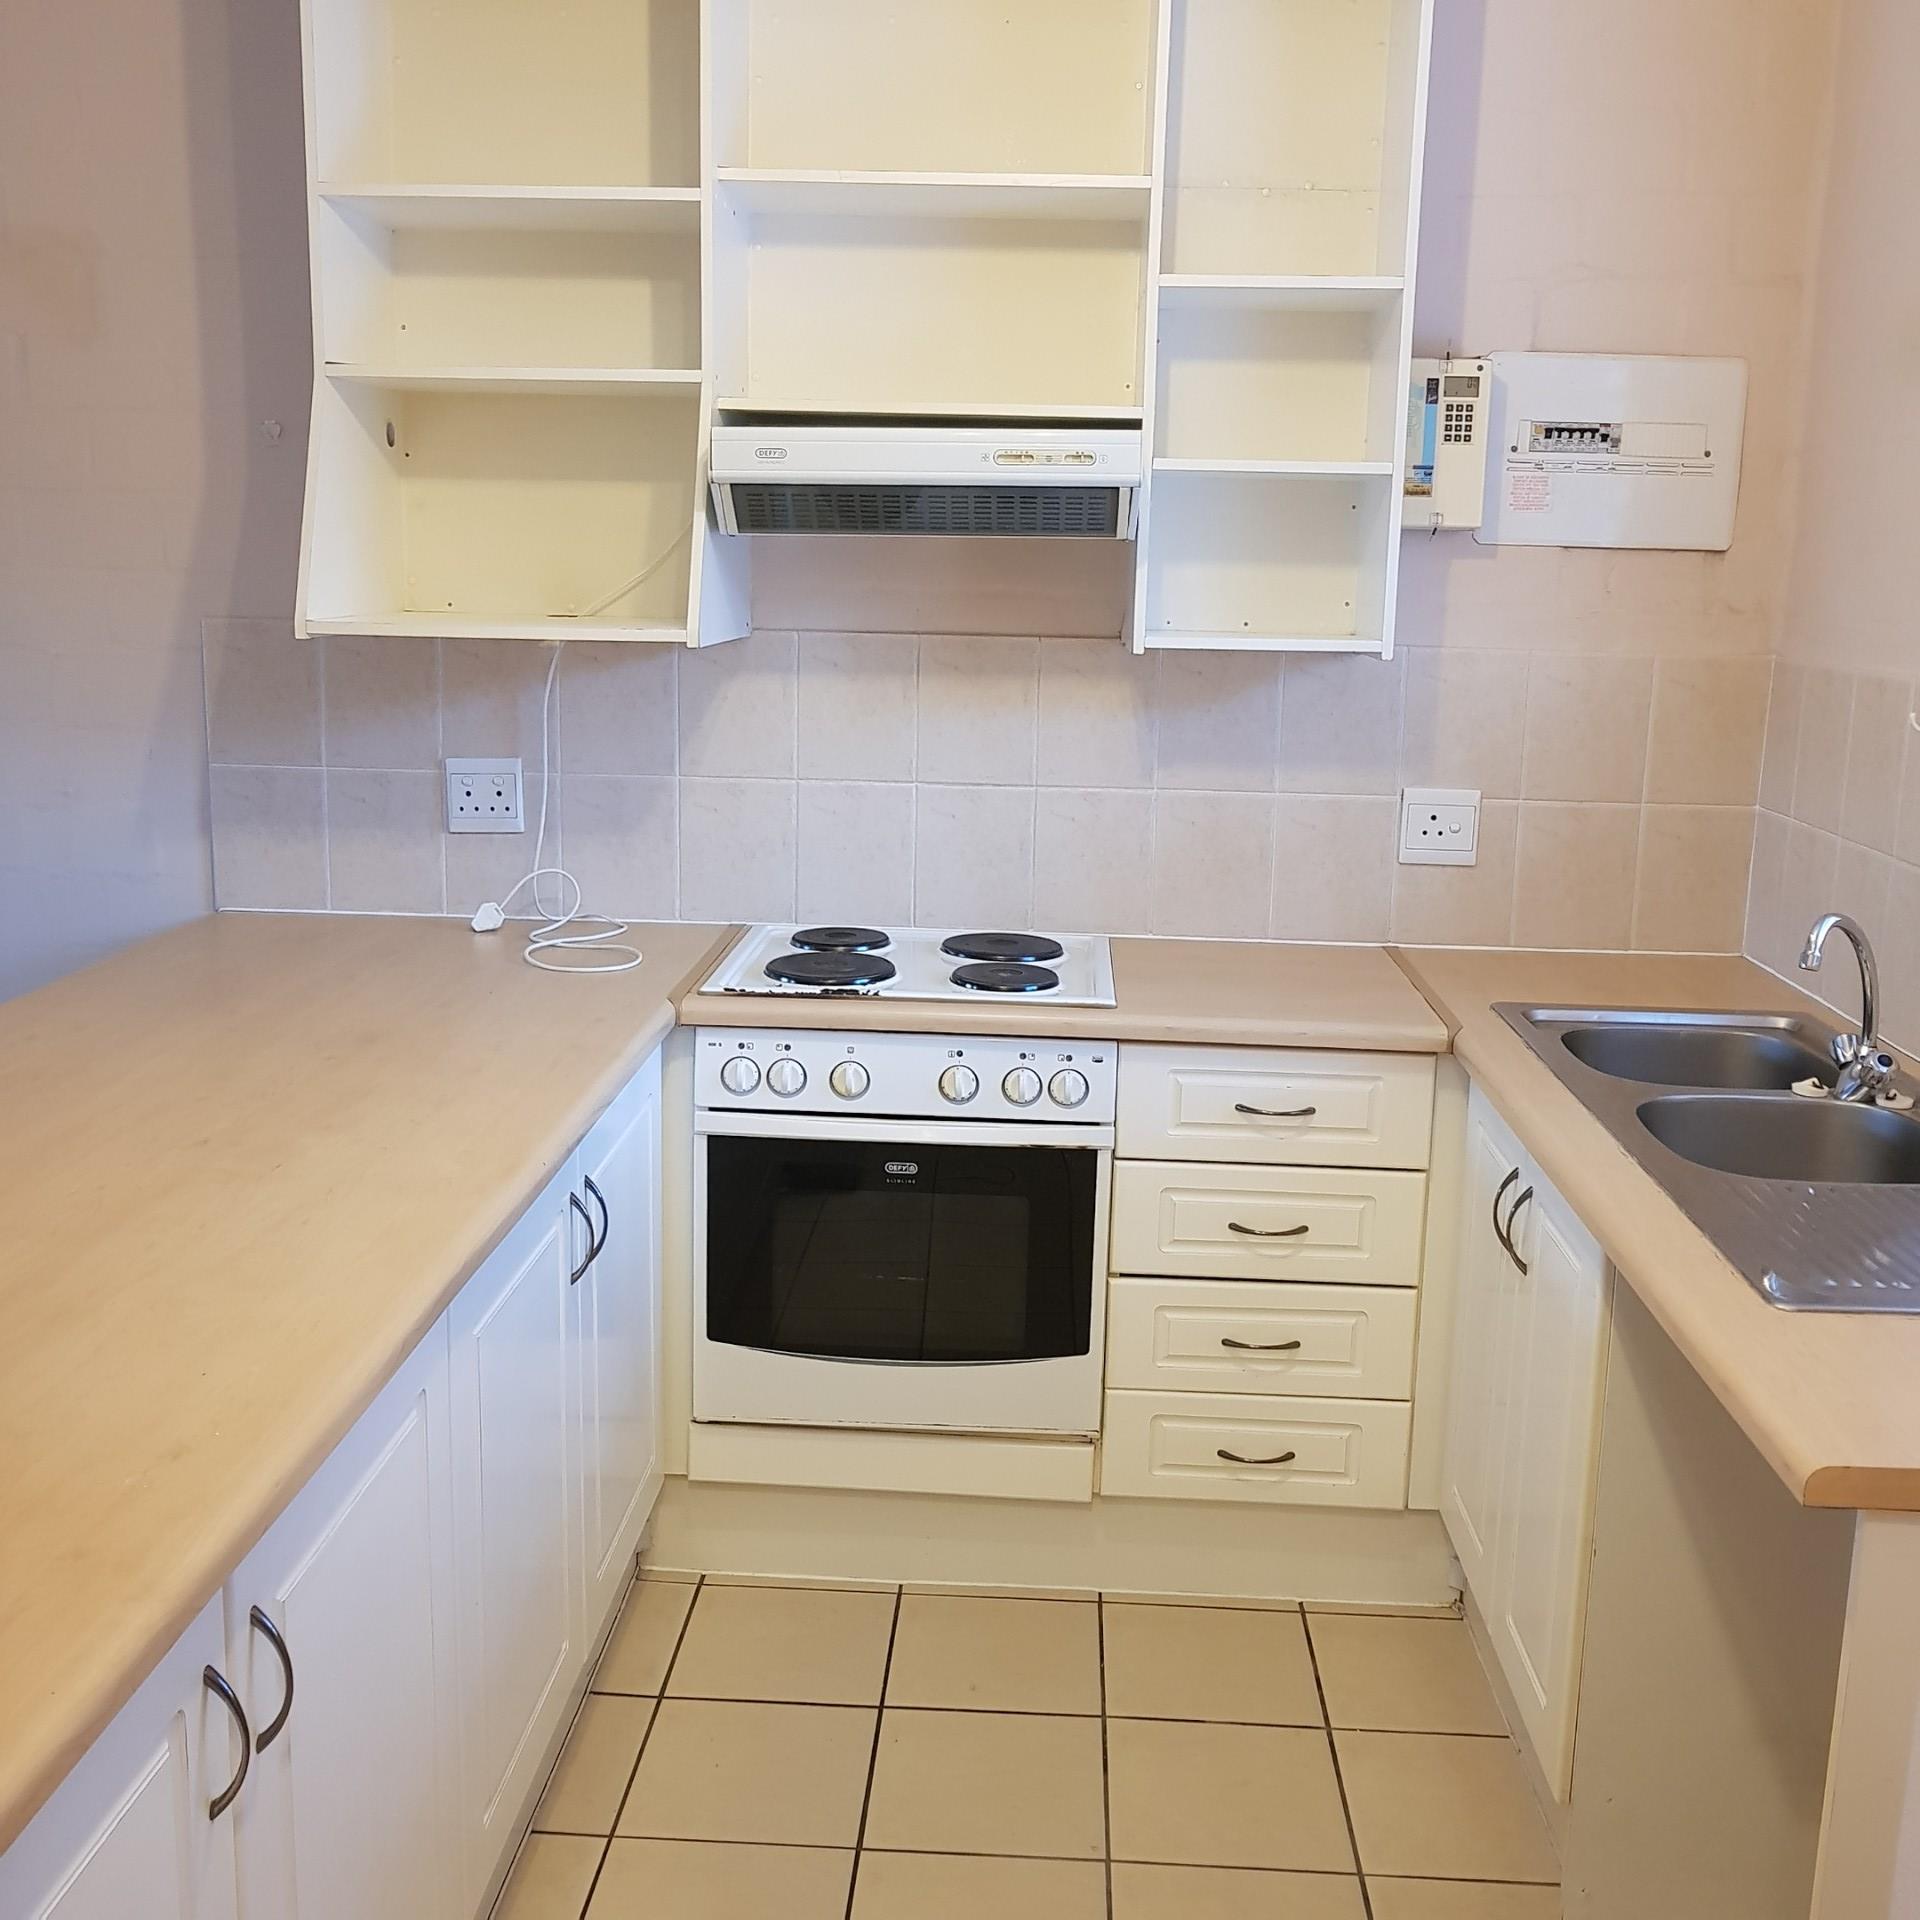 2 Bedroom Town house To Rent in Parklands